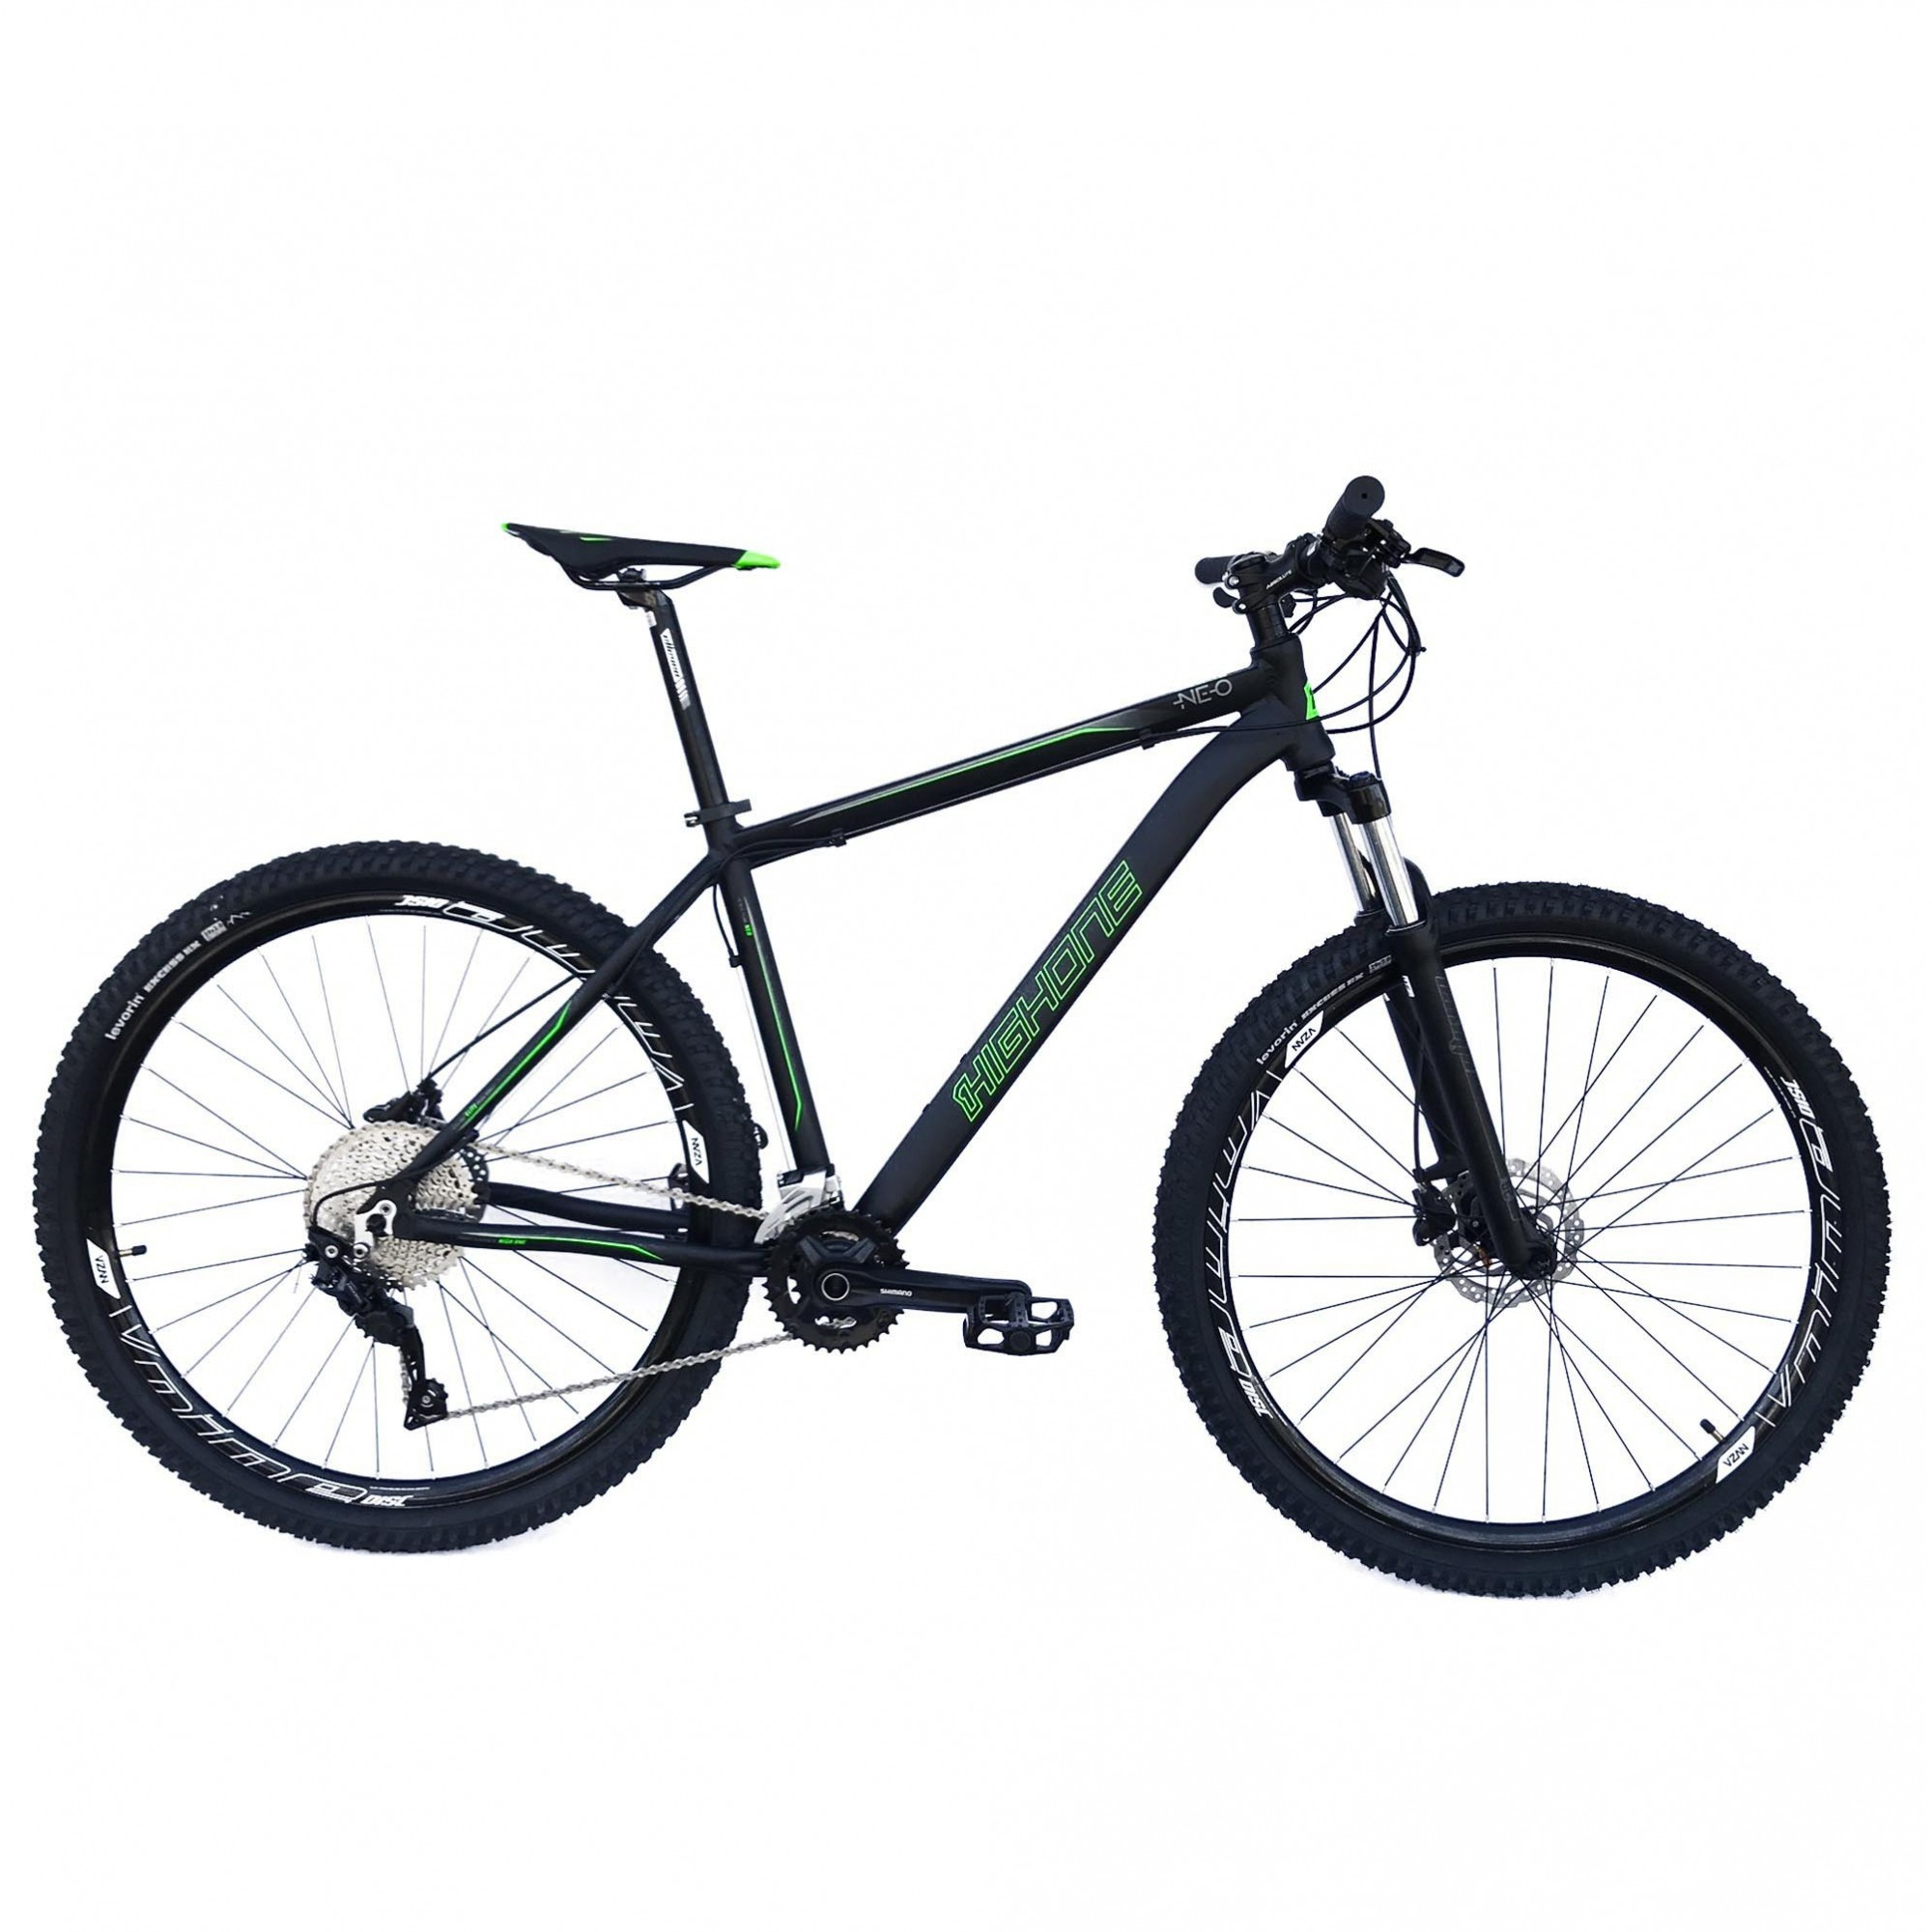 Bike 29 Neo 2x10 Shimano Freio Hidraulico High One